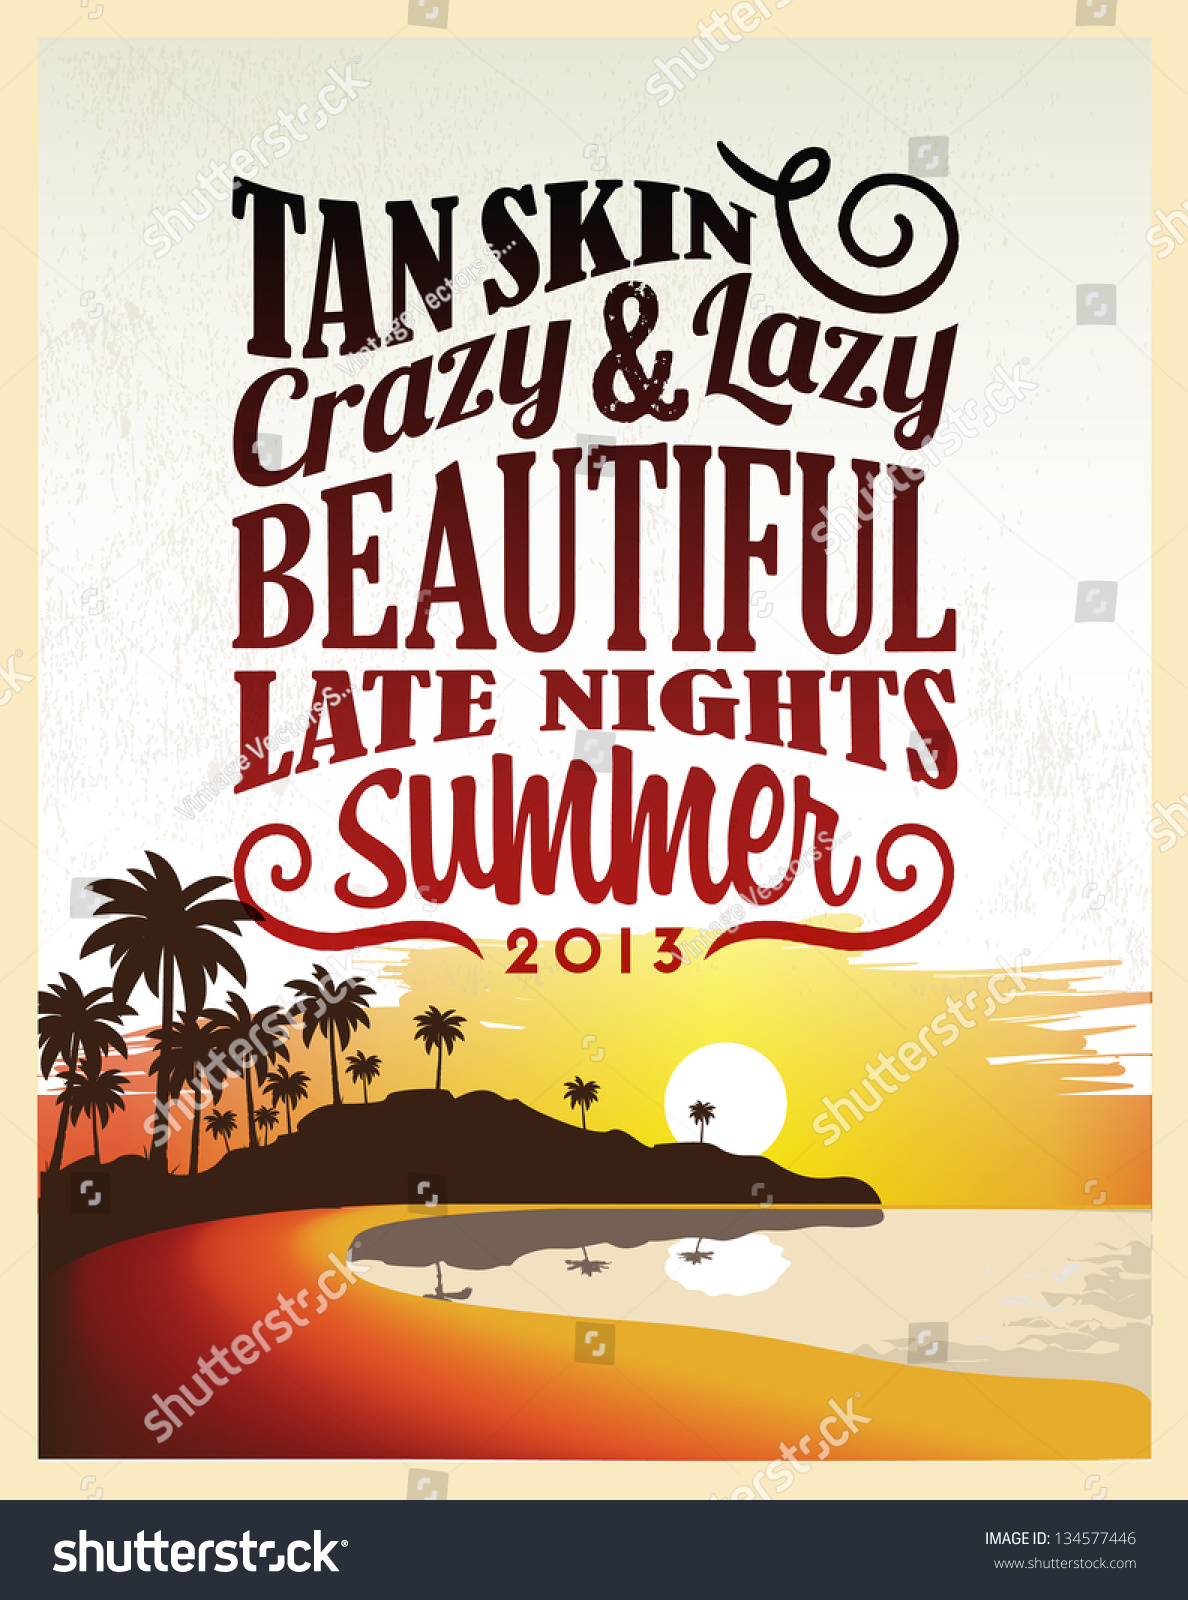 Design poster retro - Retro Vintage Summer Poster Design With Typography